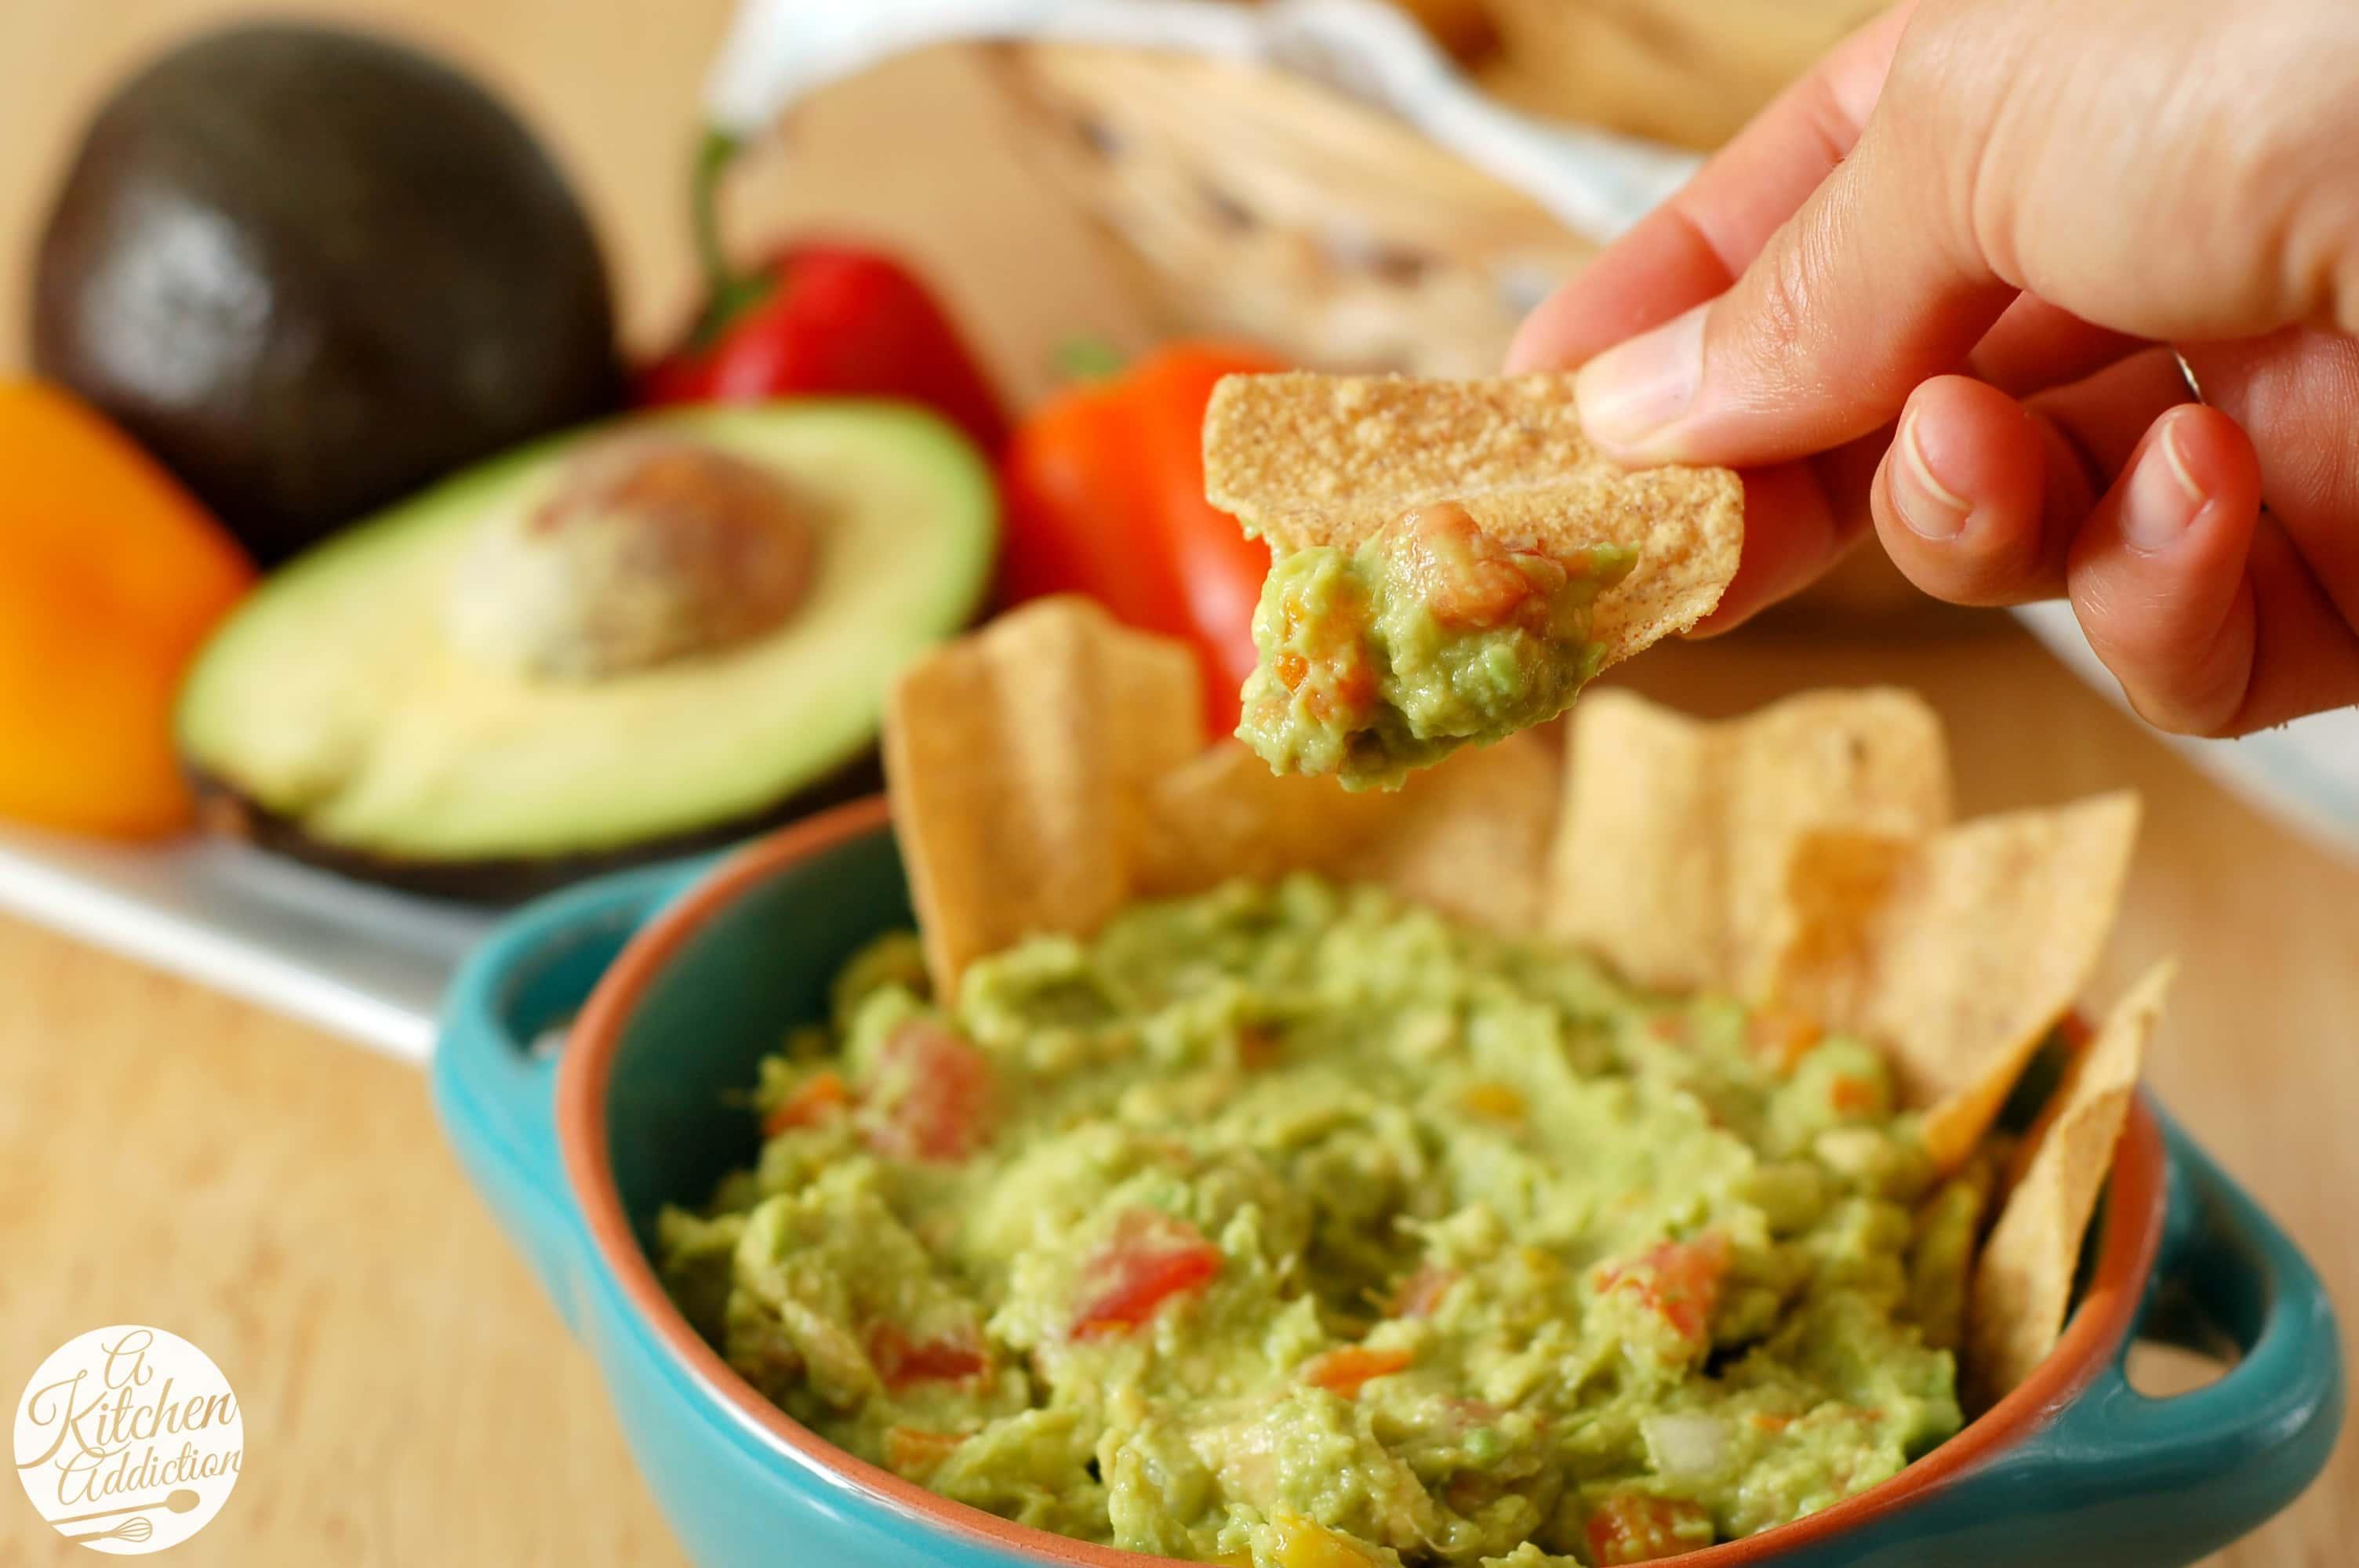 Easy garden guacamole a kitchen addiction for A kitchen addiction